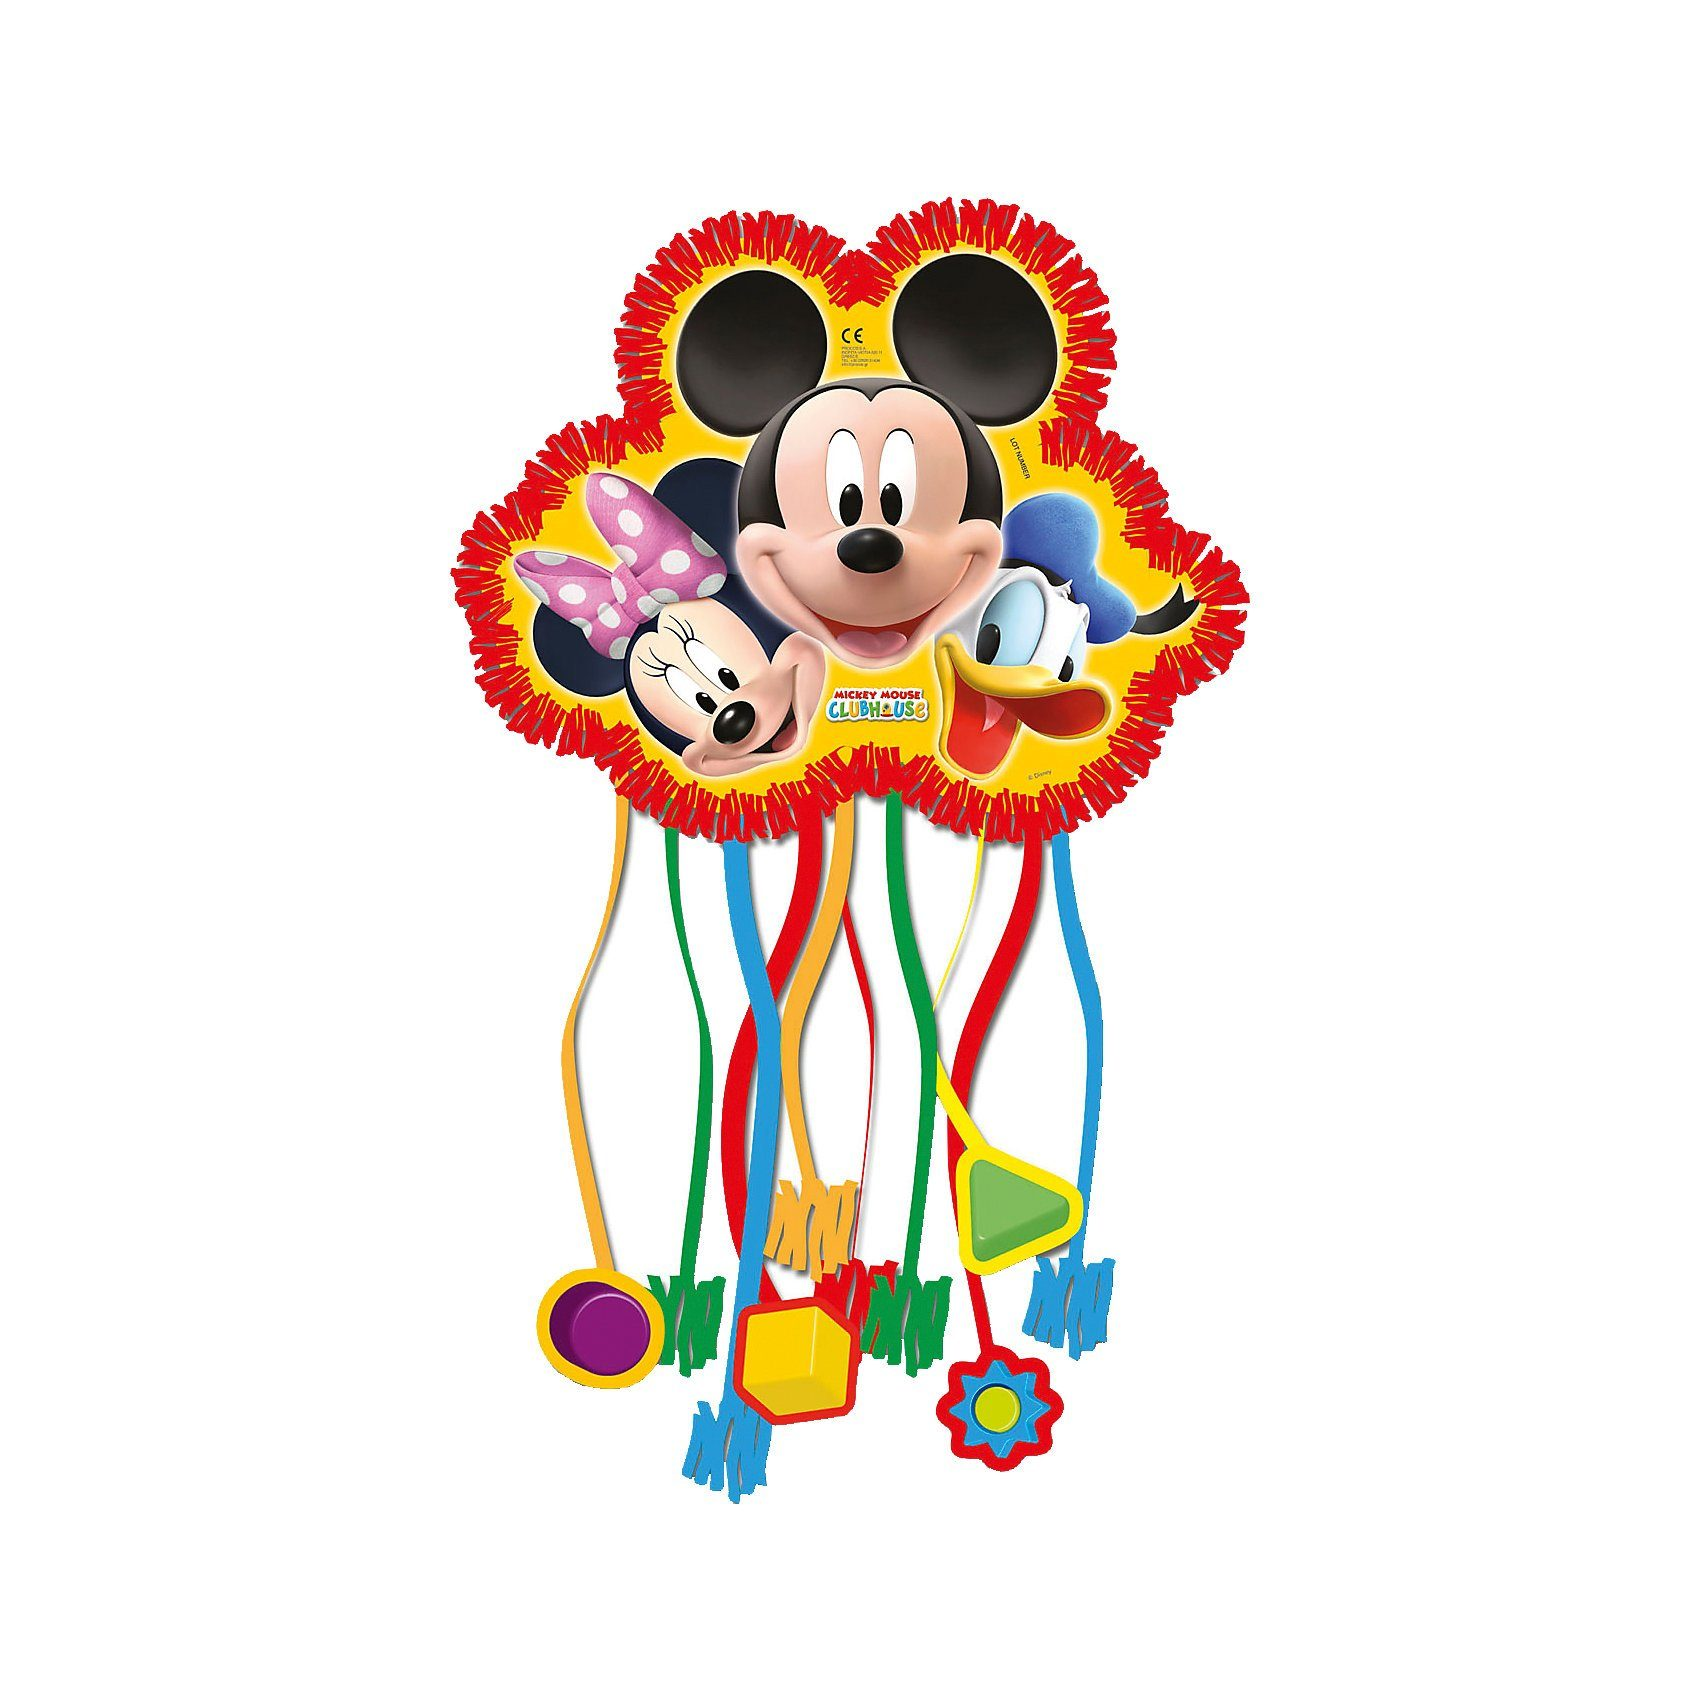 Procos Pull-Pinata Playful Mickey